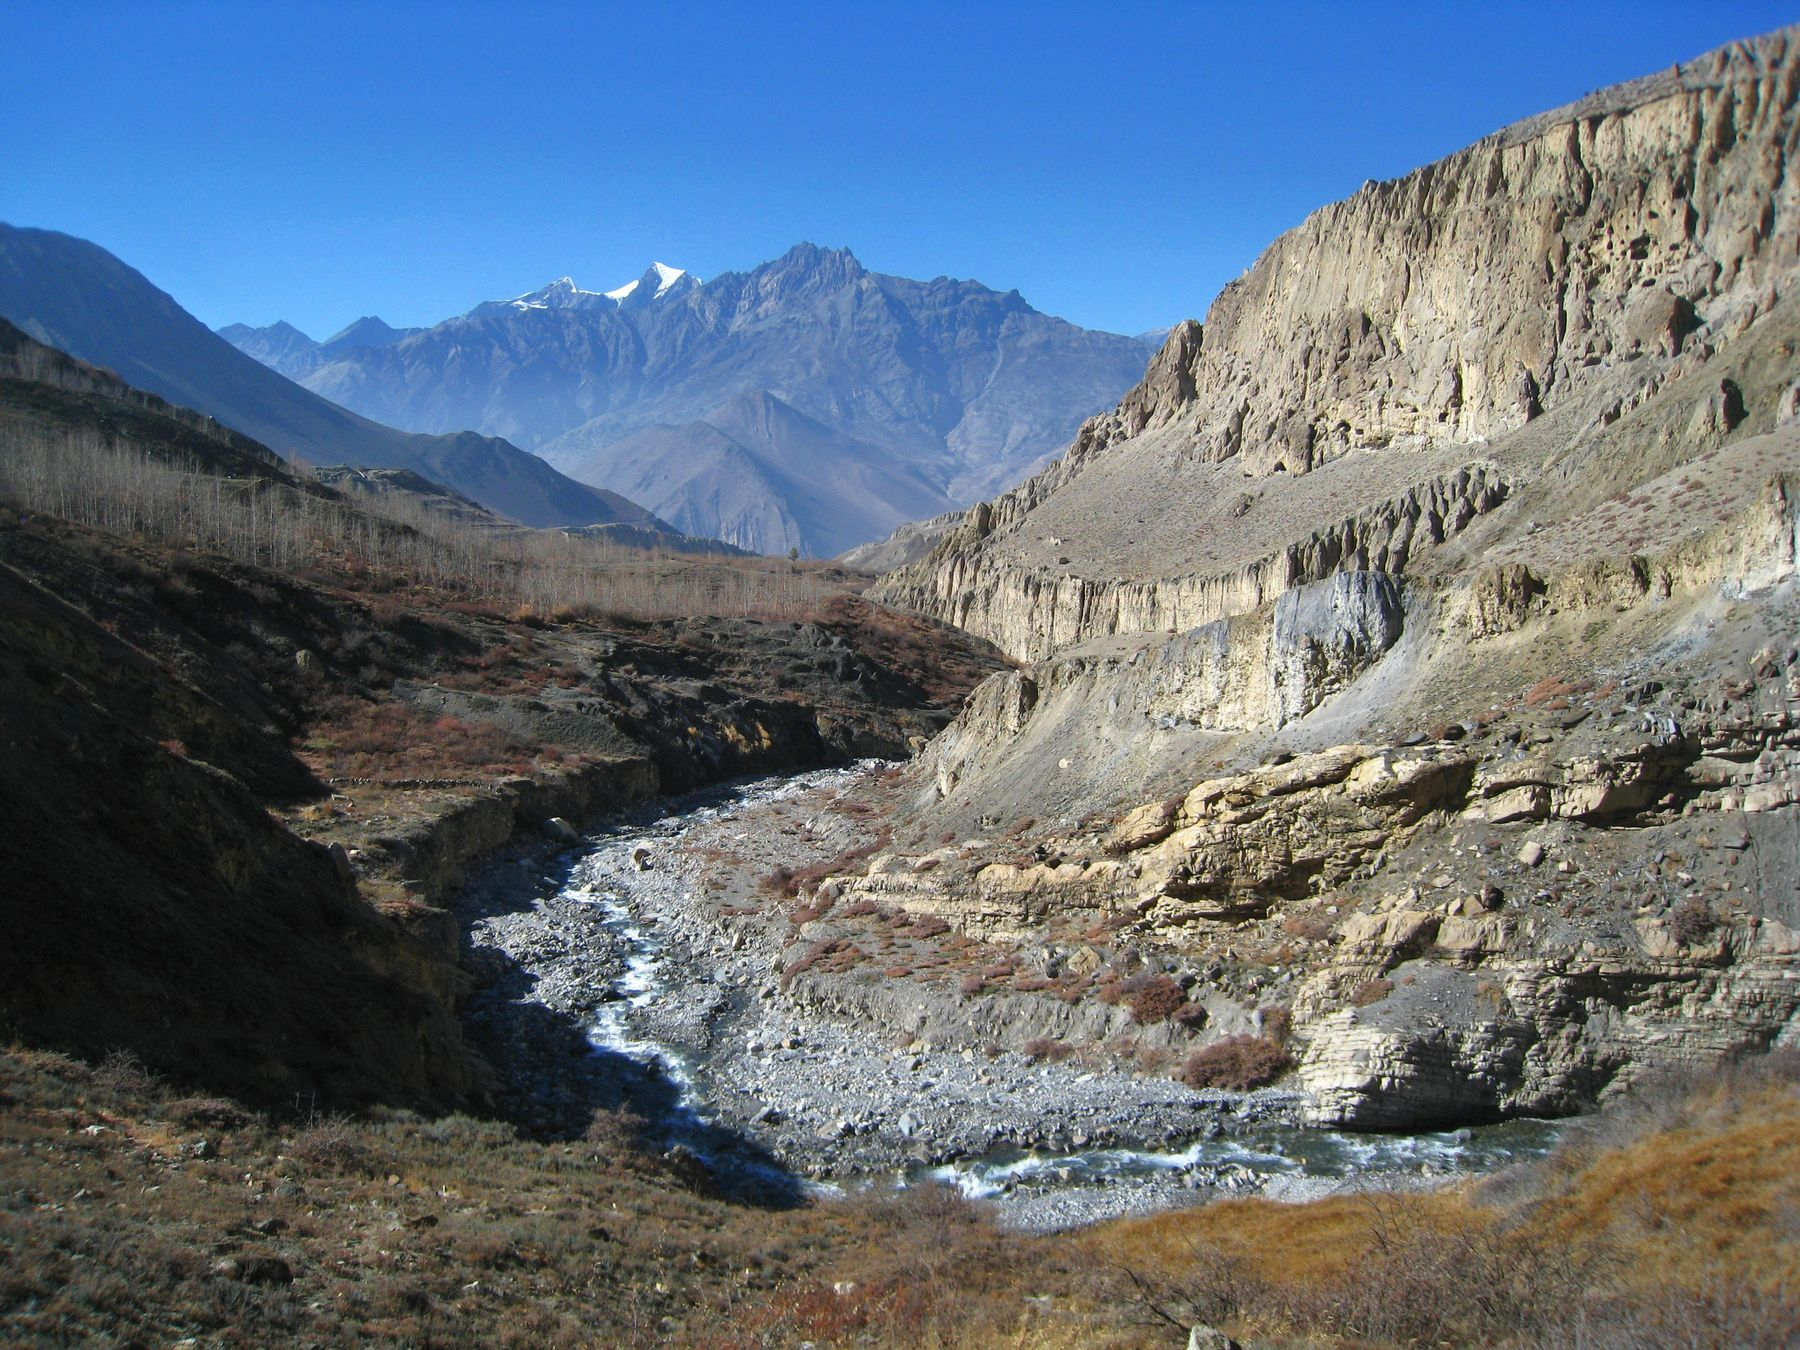 Осень в гималаях. Непал вулкан кратер горы скалы